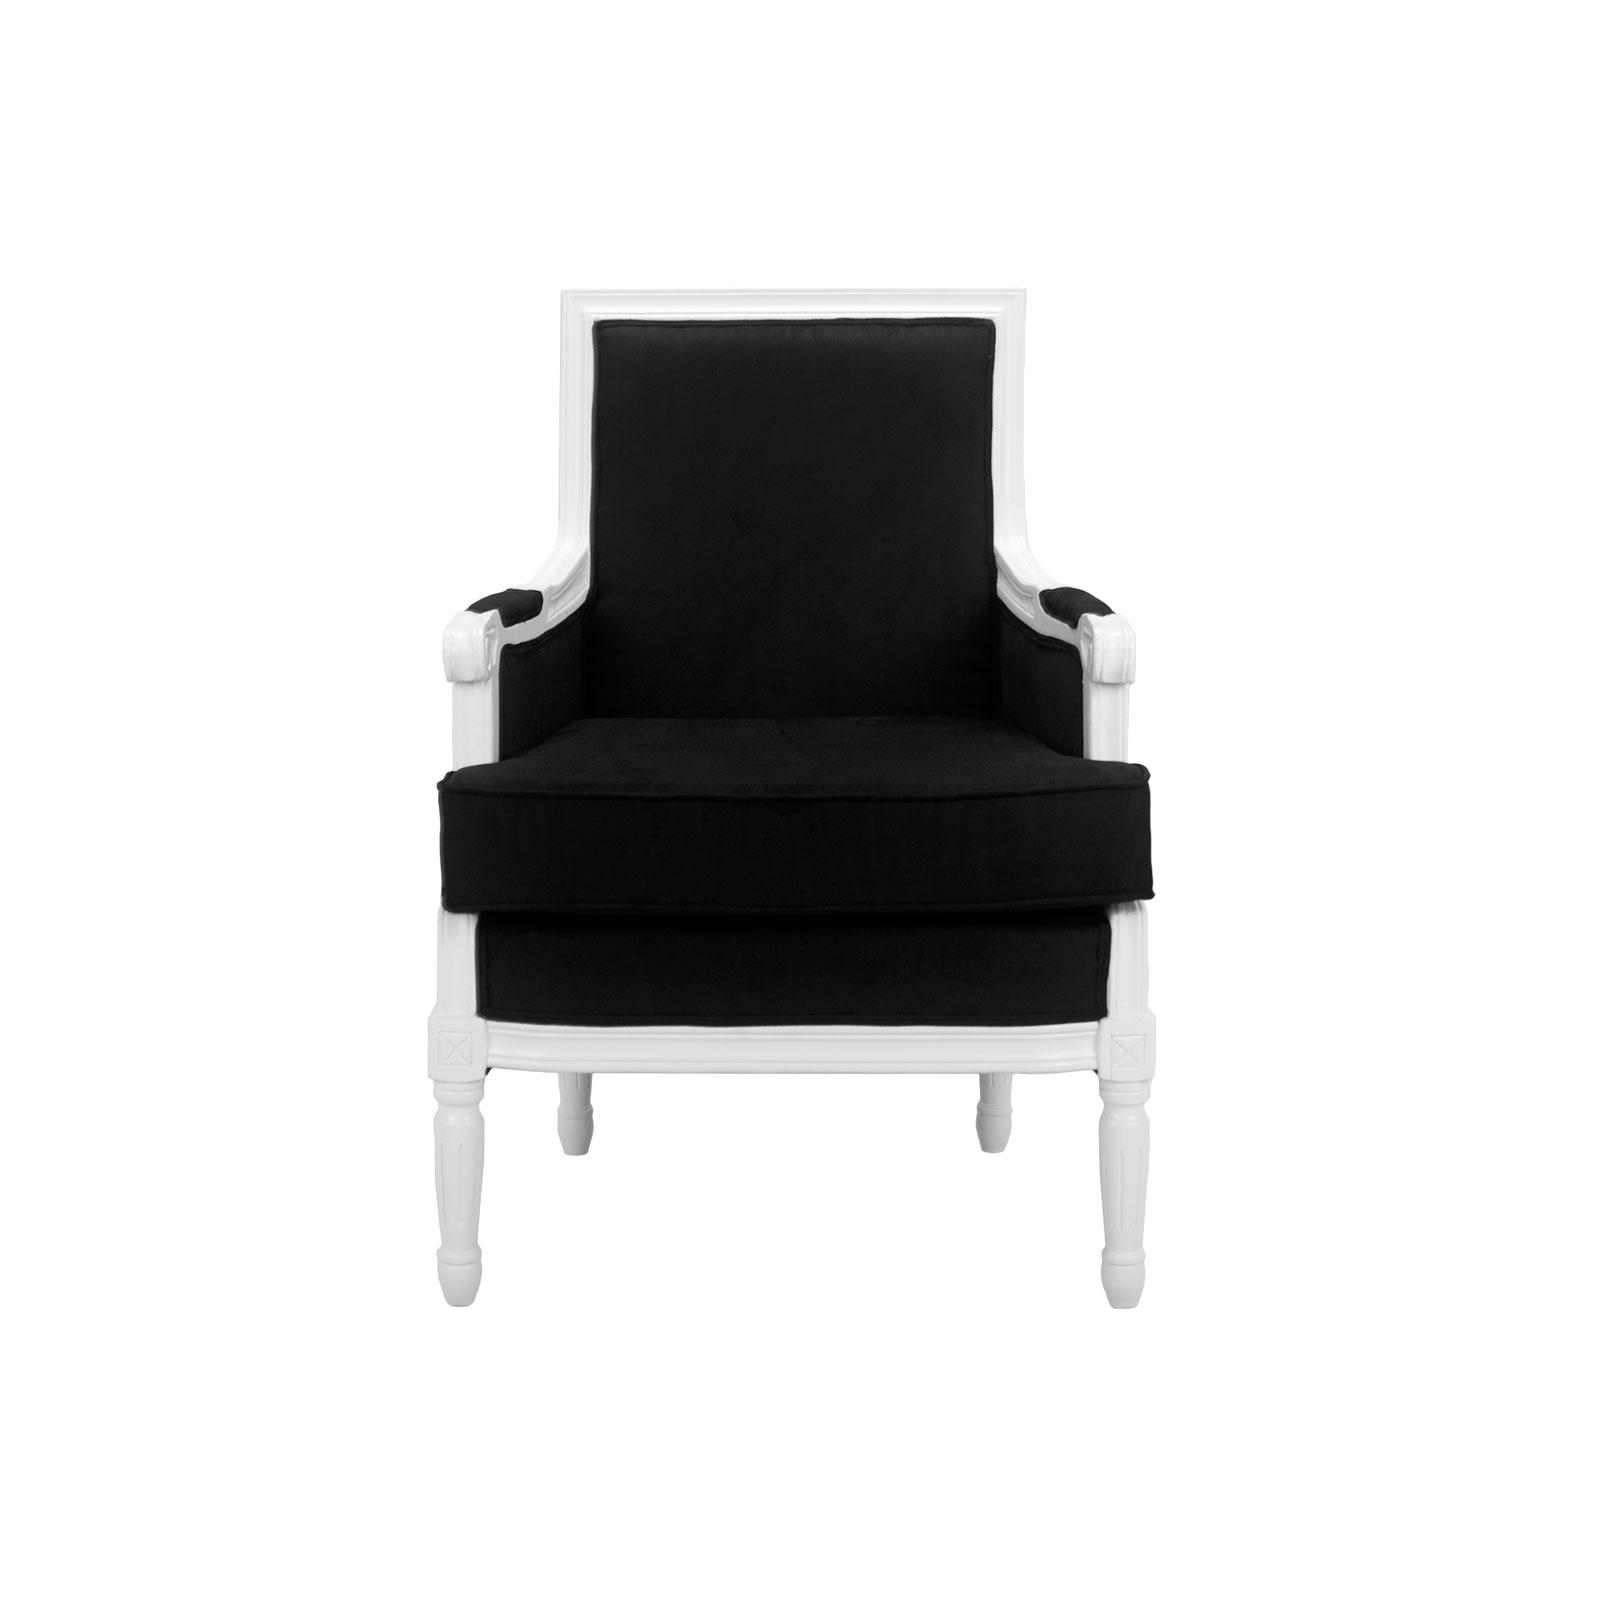 Louie vs lounge chair black formdecor for Chair vs chairman